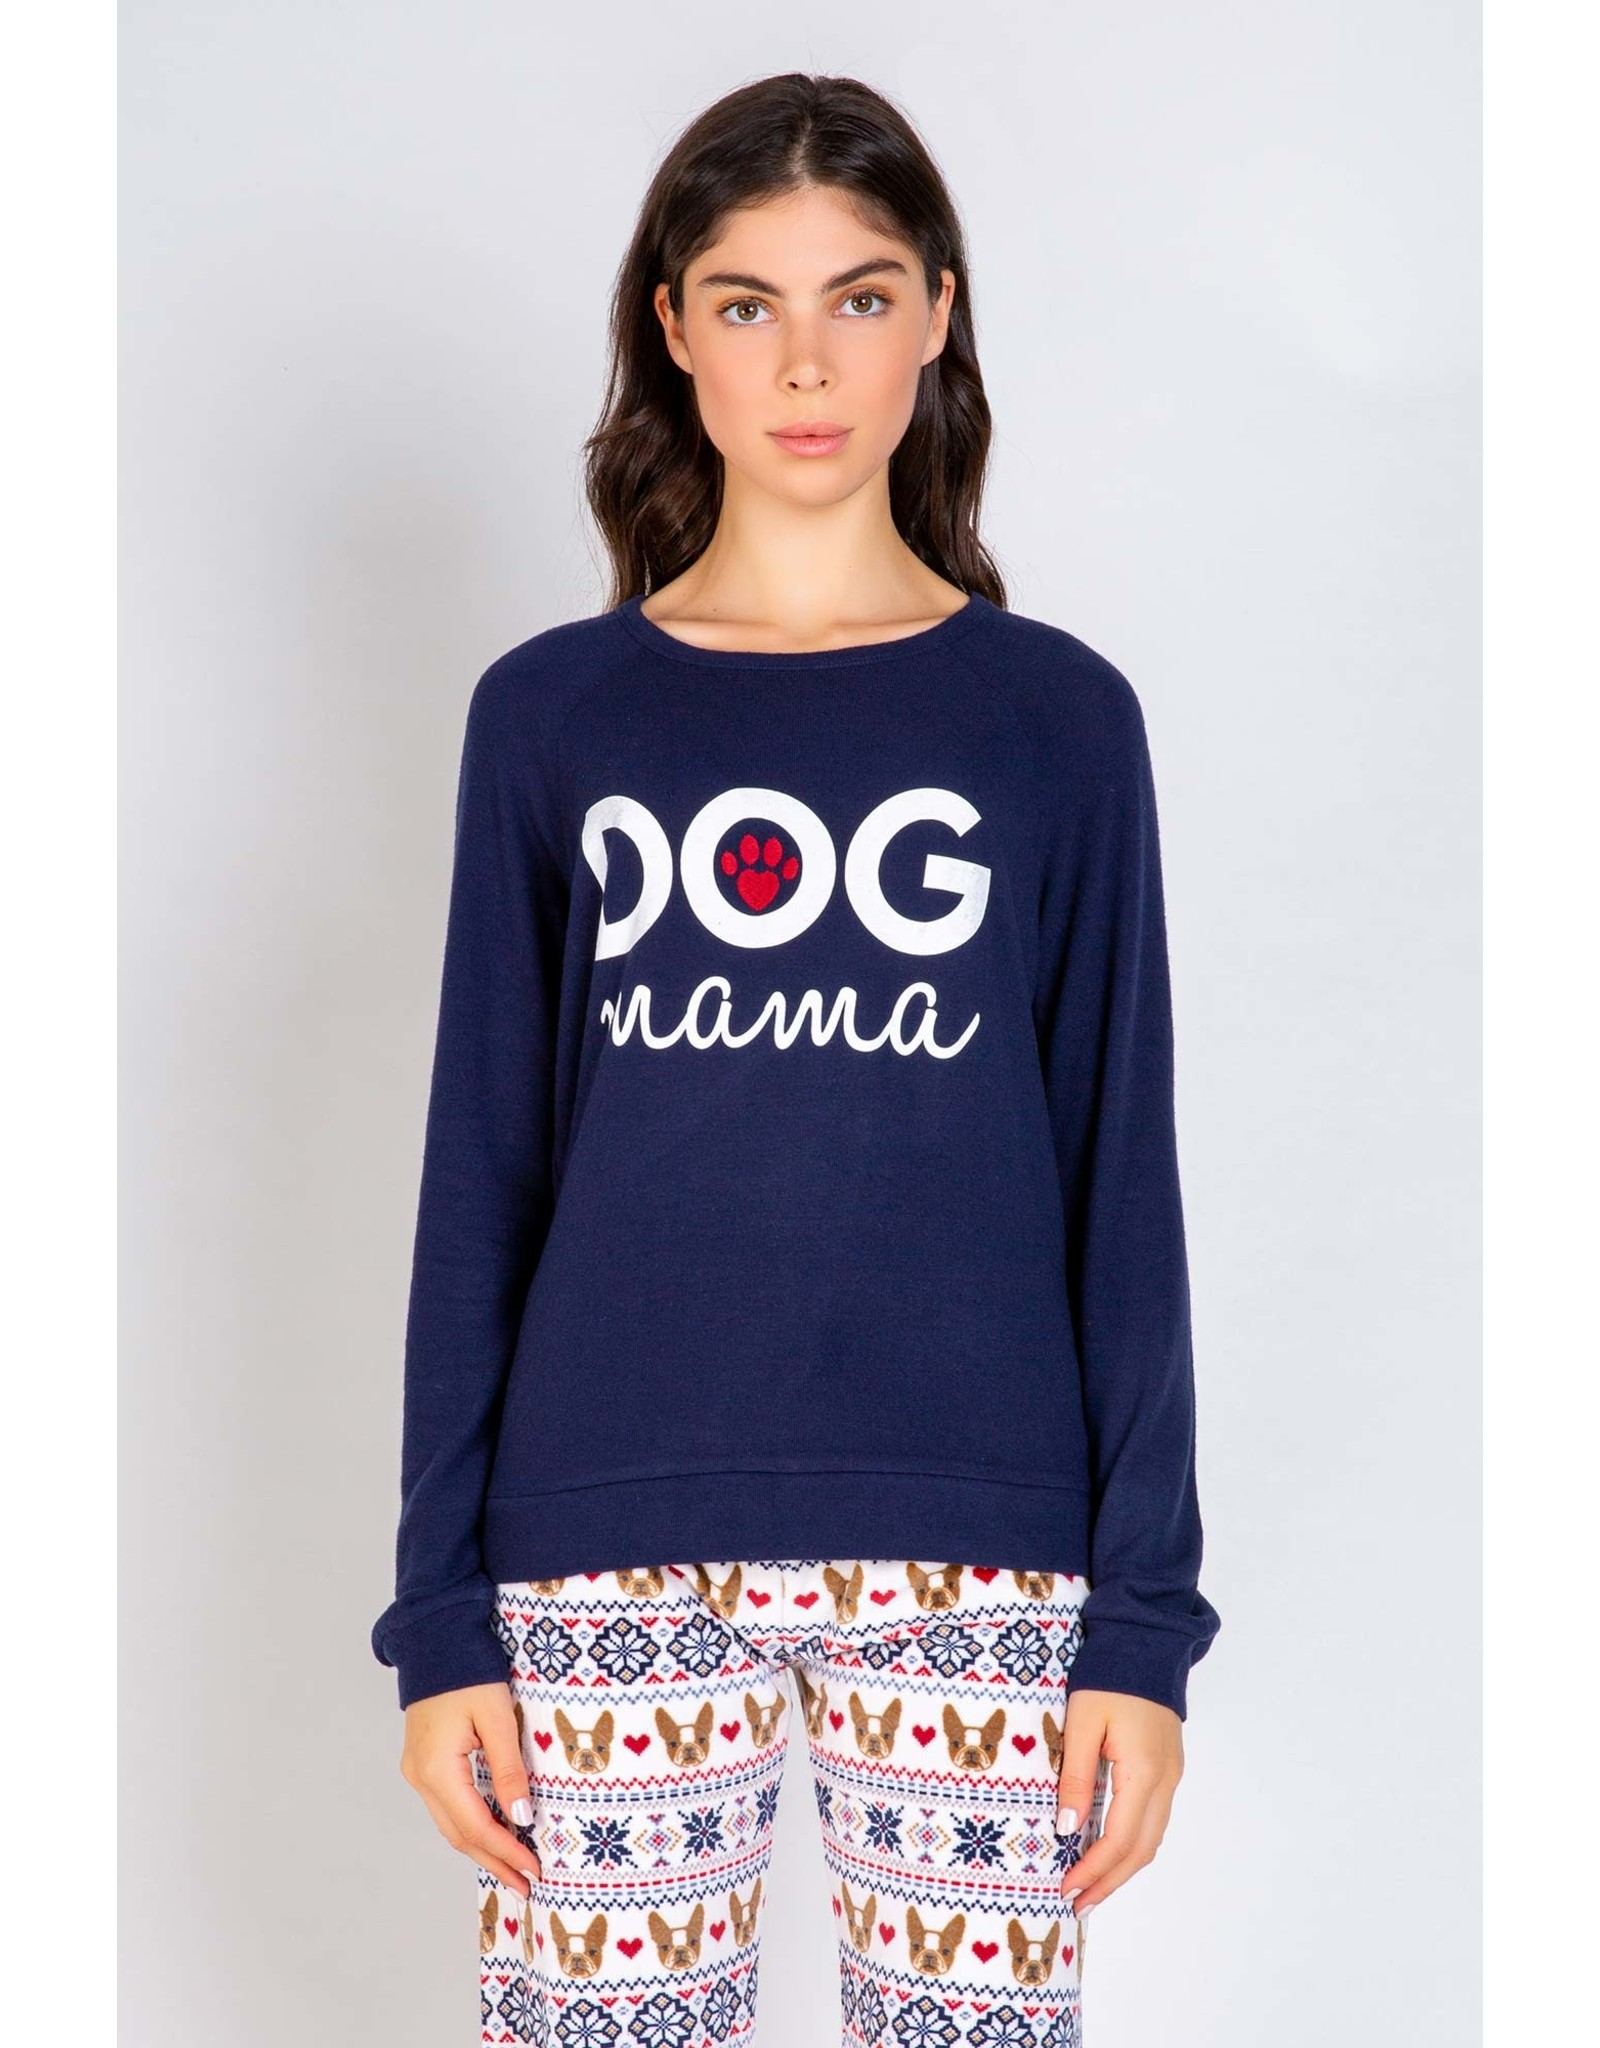 PJ Salvage PJ Salvage Dog Mama LS Top